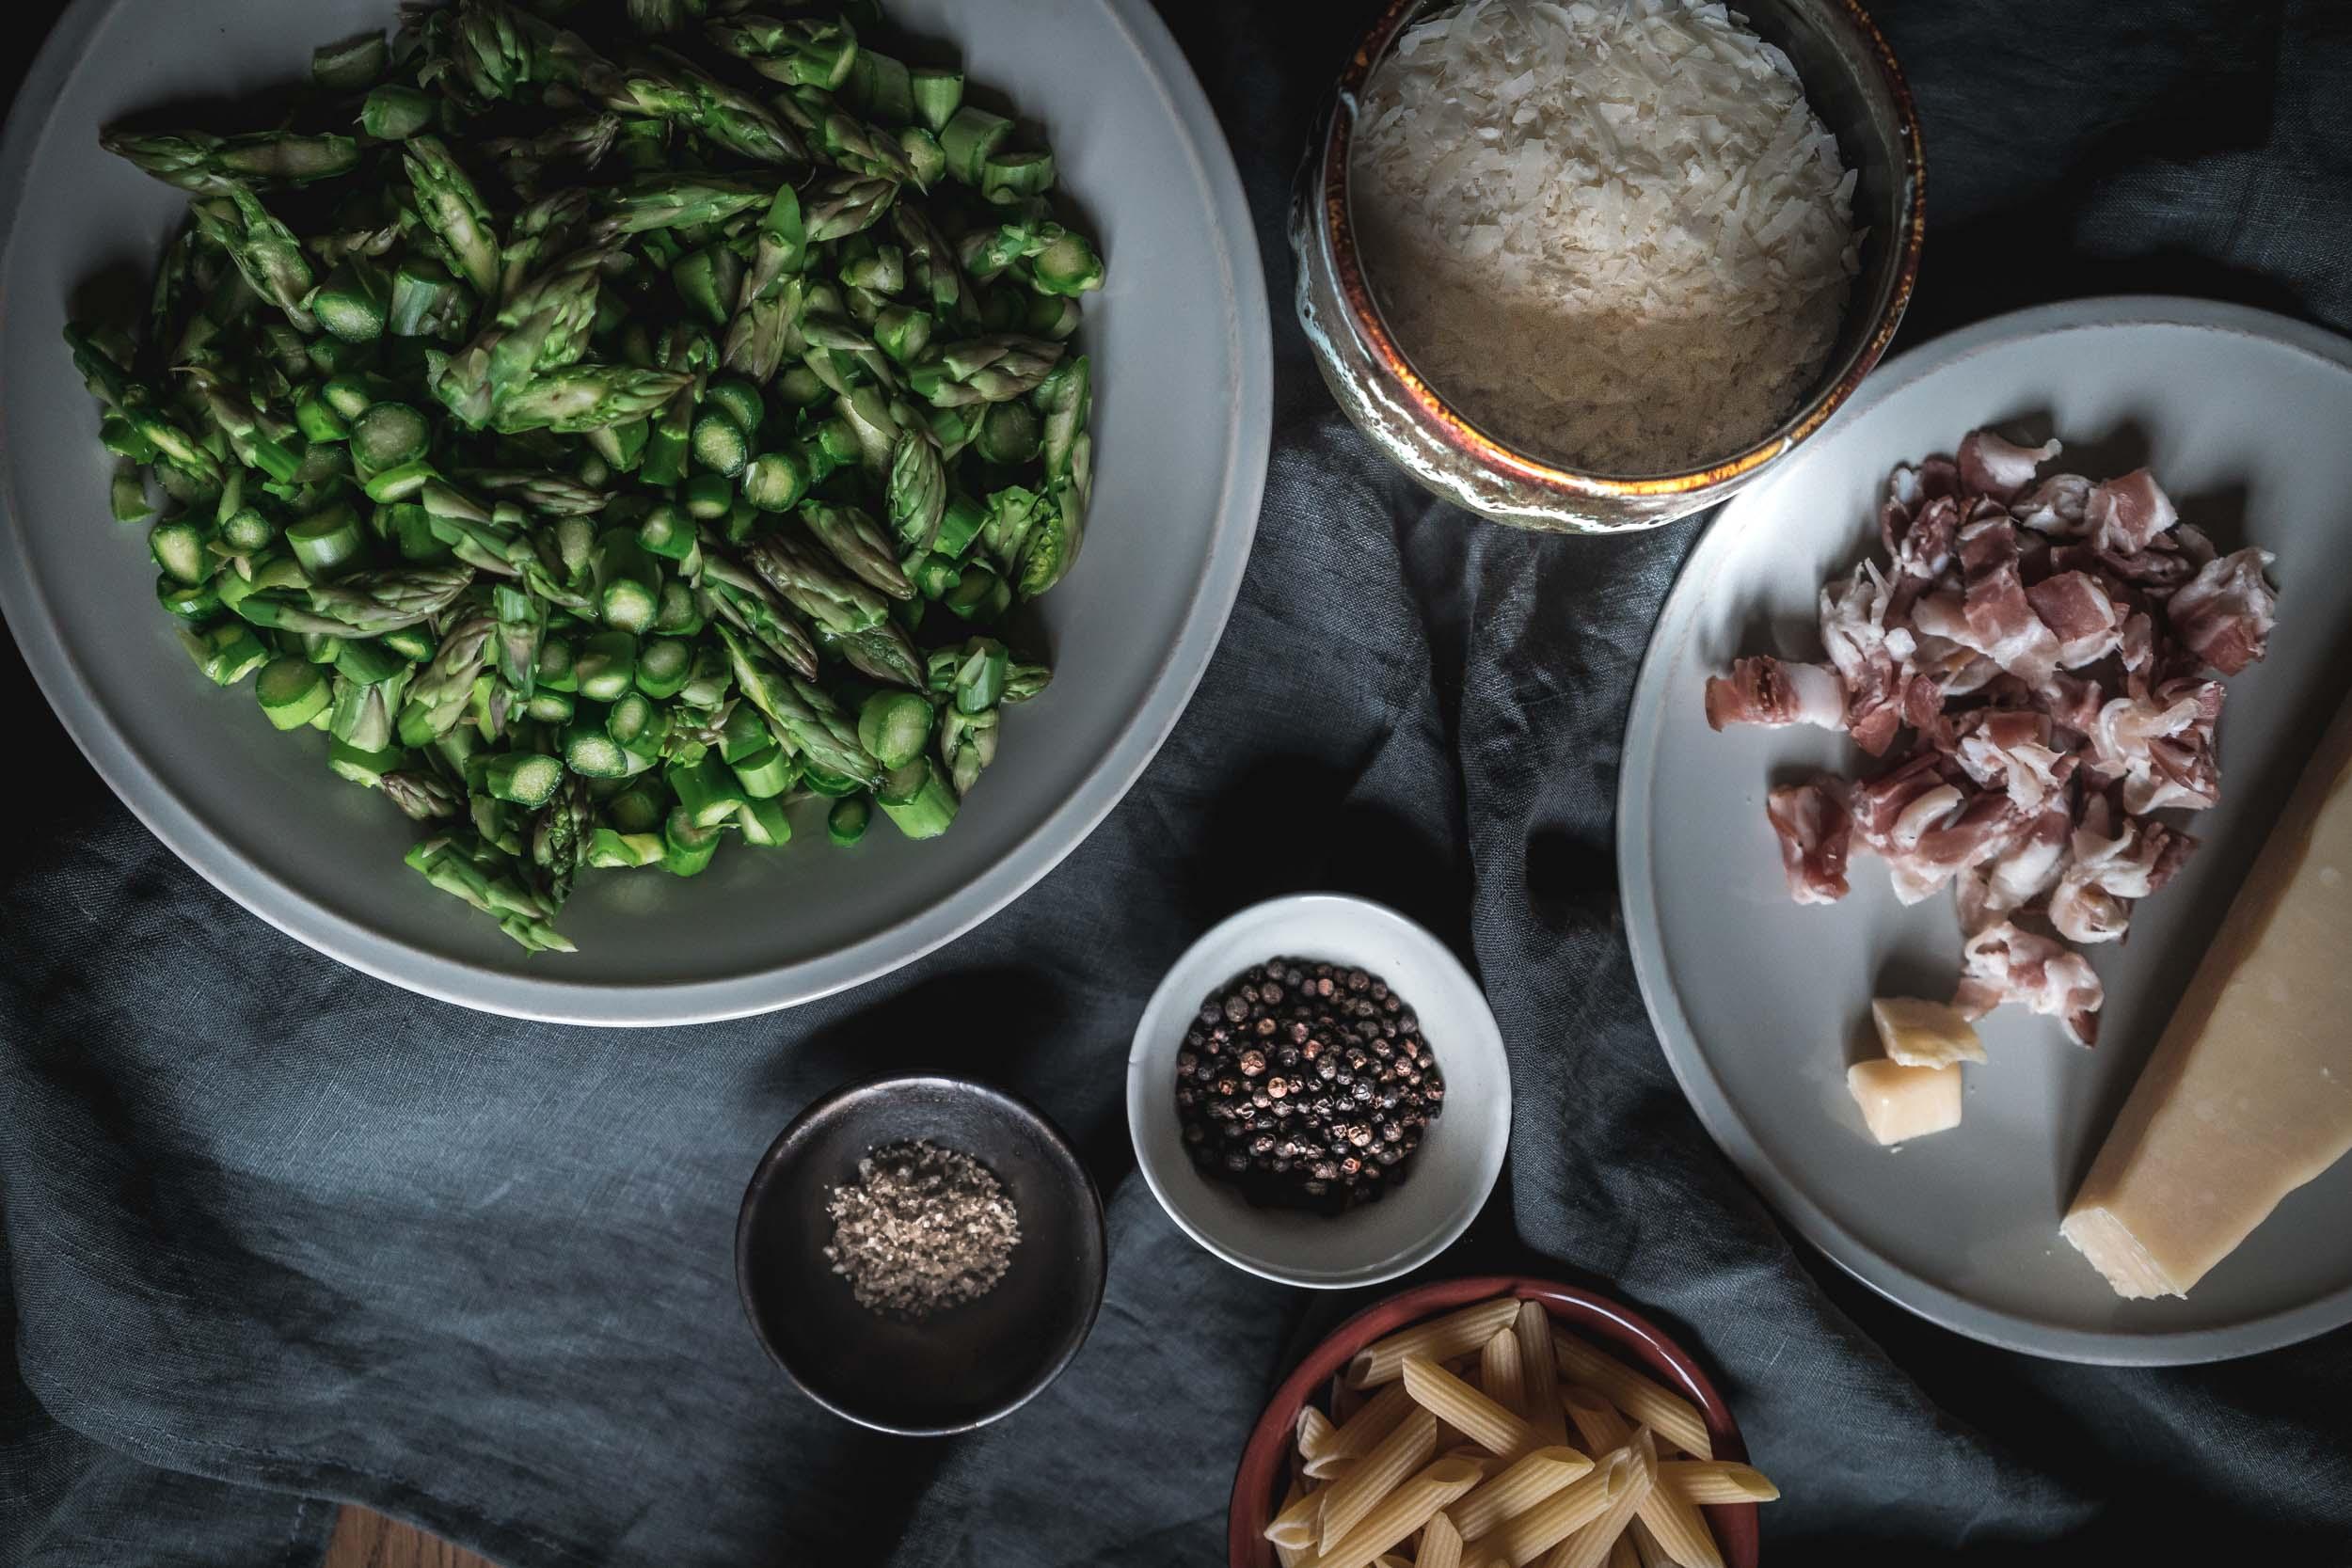 Asparagus-and-Bacon-Penne-Pasta-05102.jpg